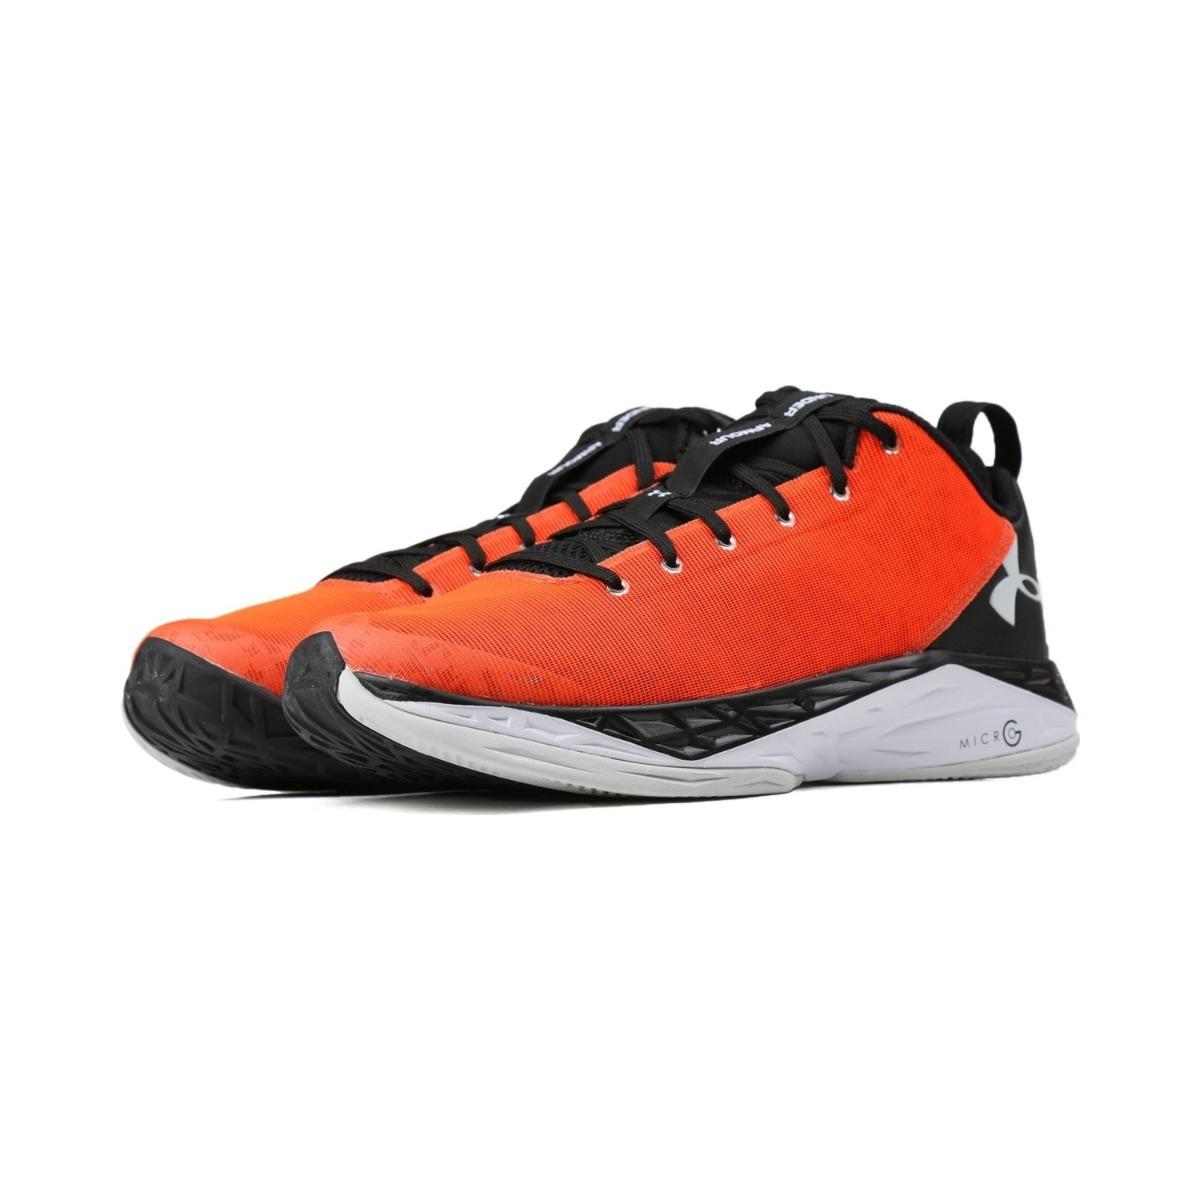 08134335cfc3d Under Armour Fire Shot Low Basquetbol Curry Lebron Nba Nike ...